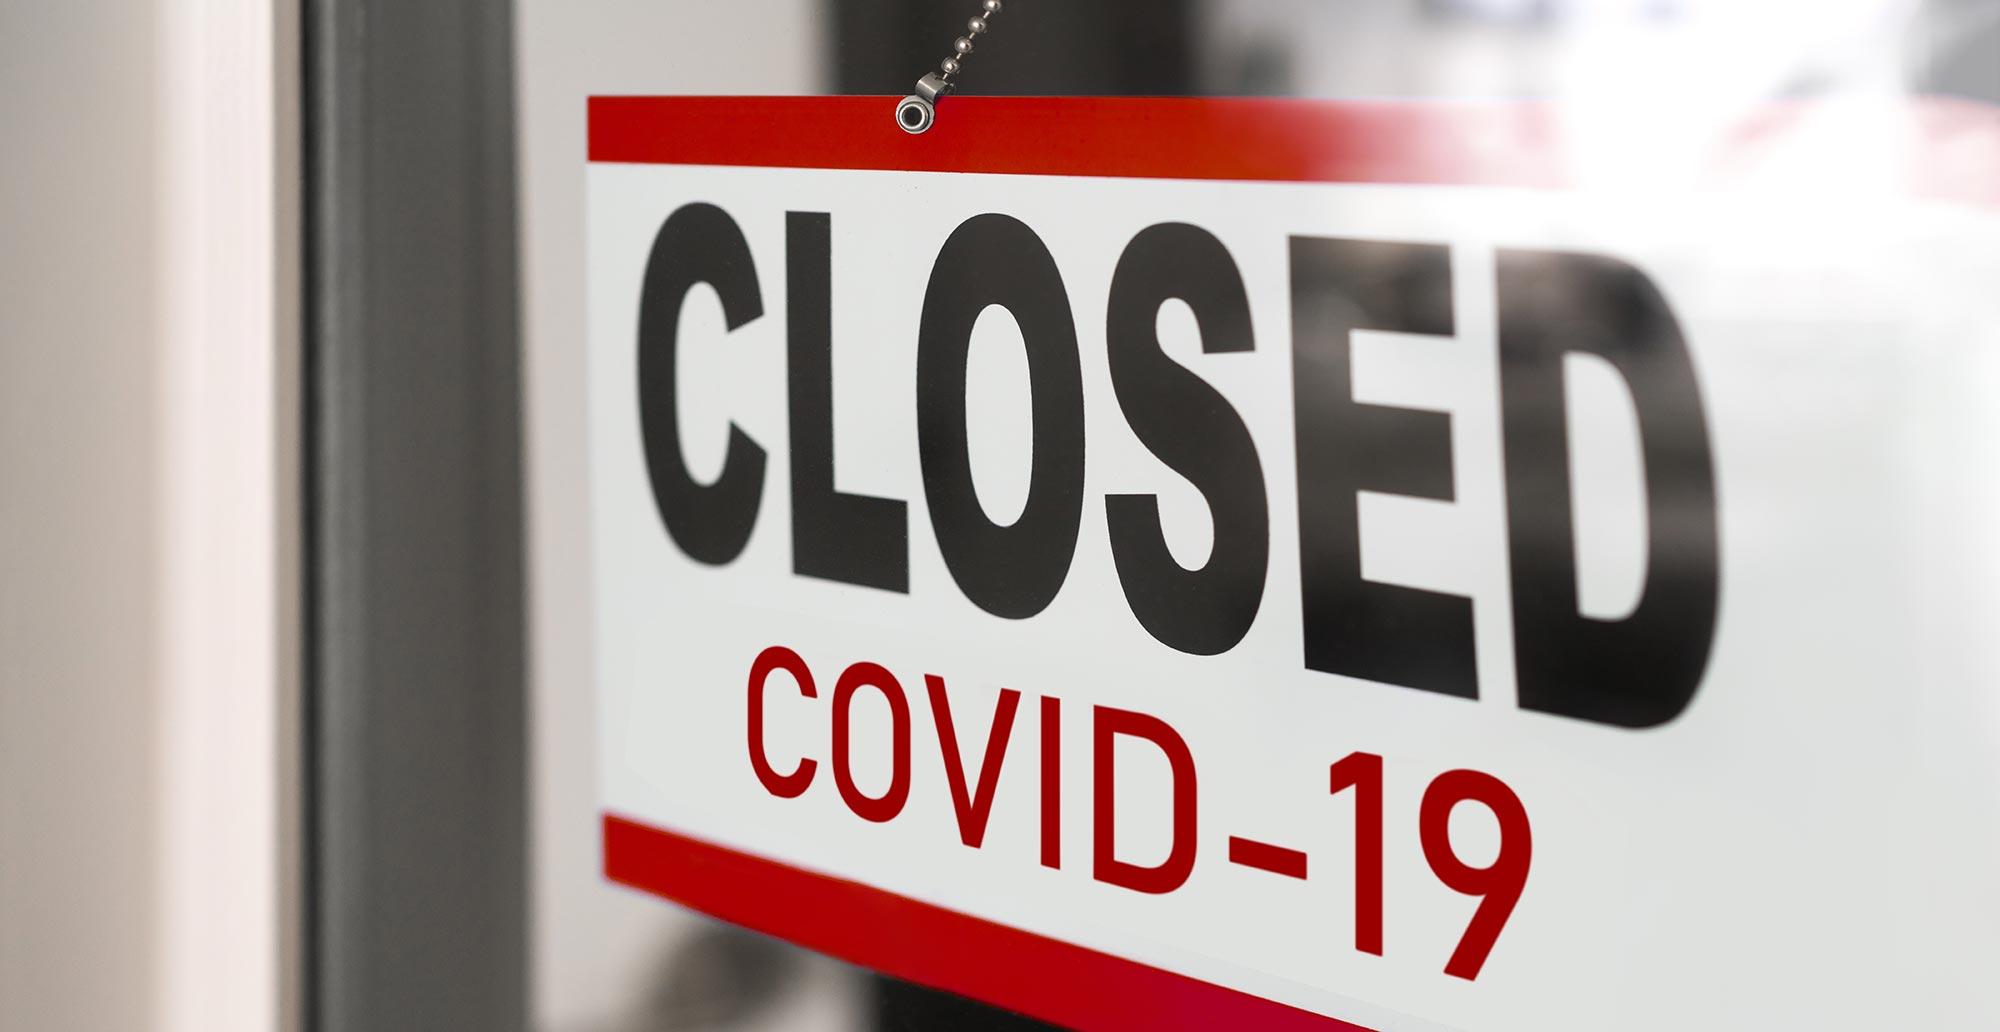 gdc closed sign